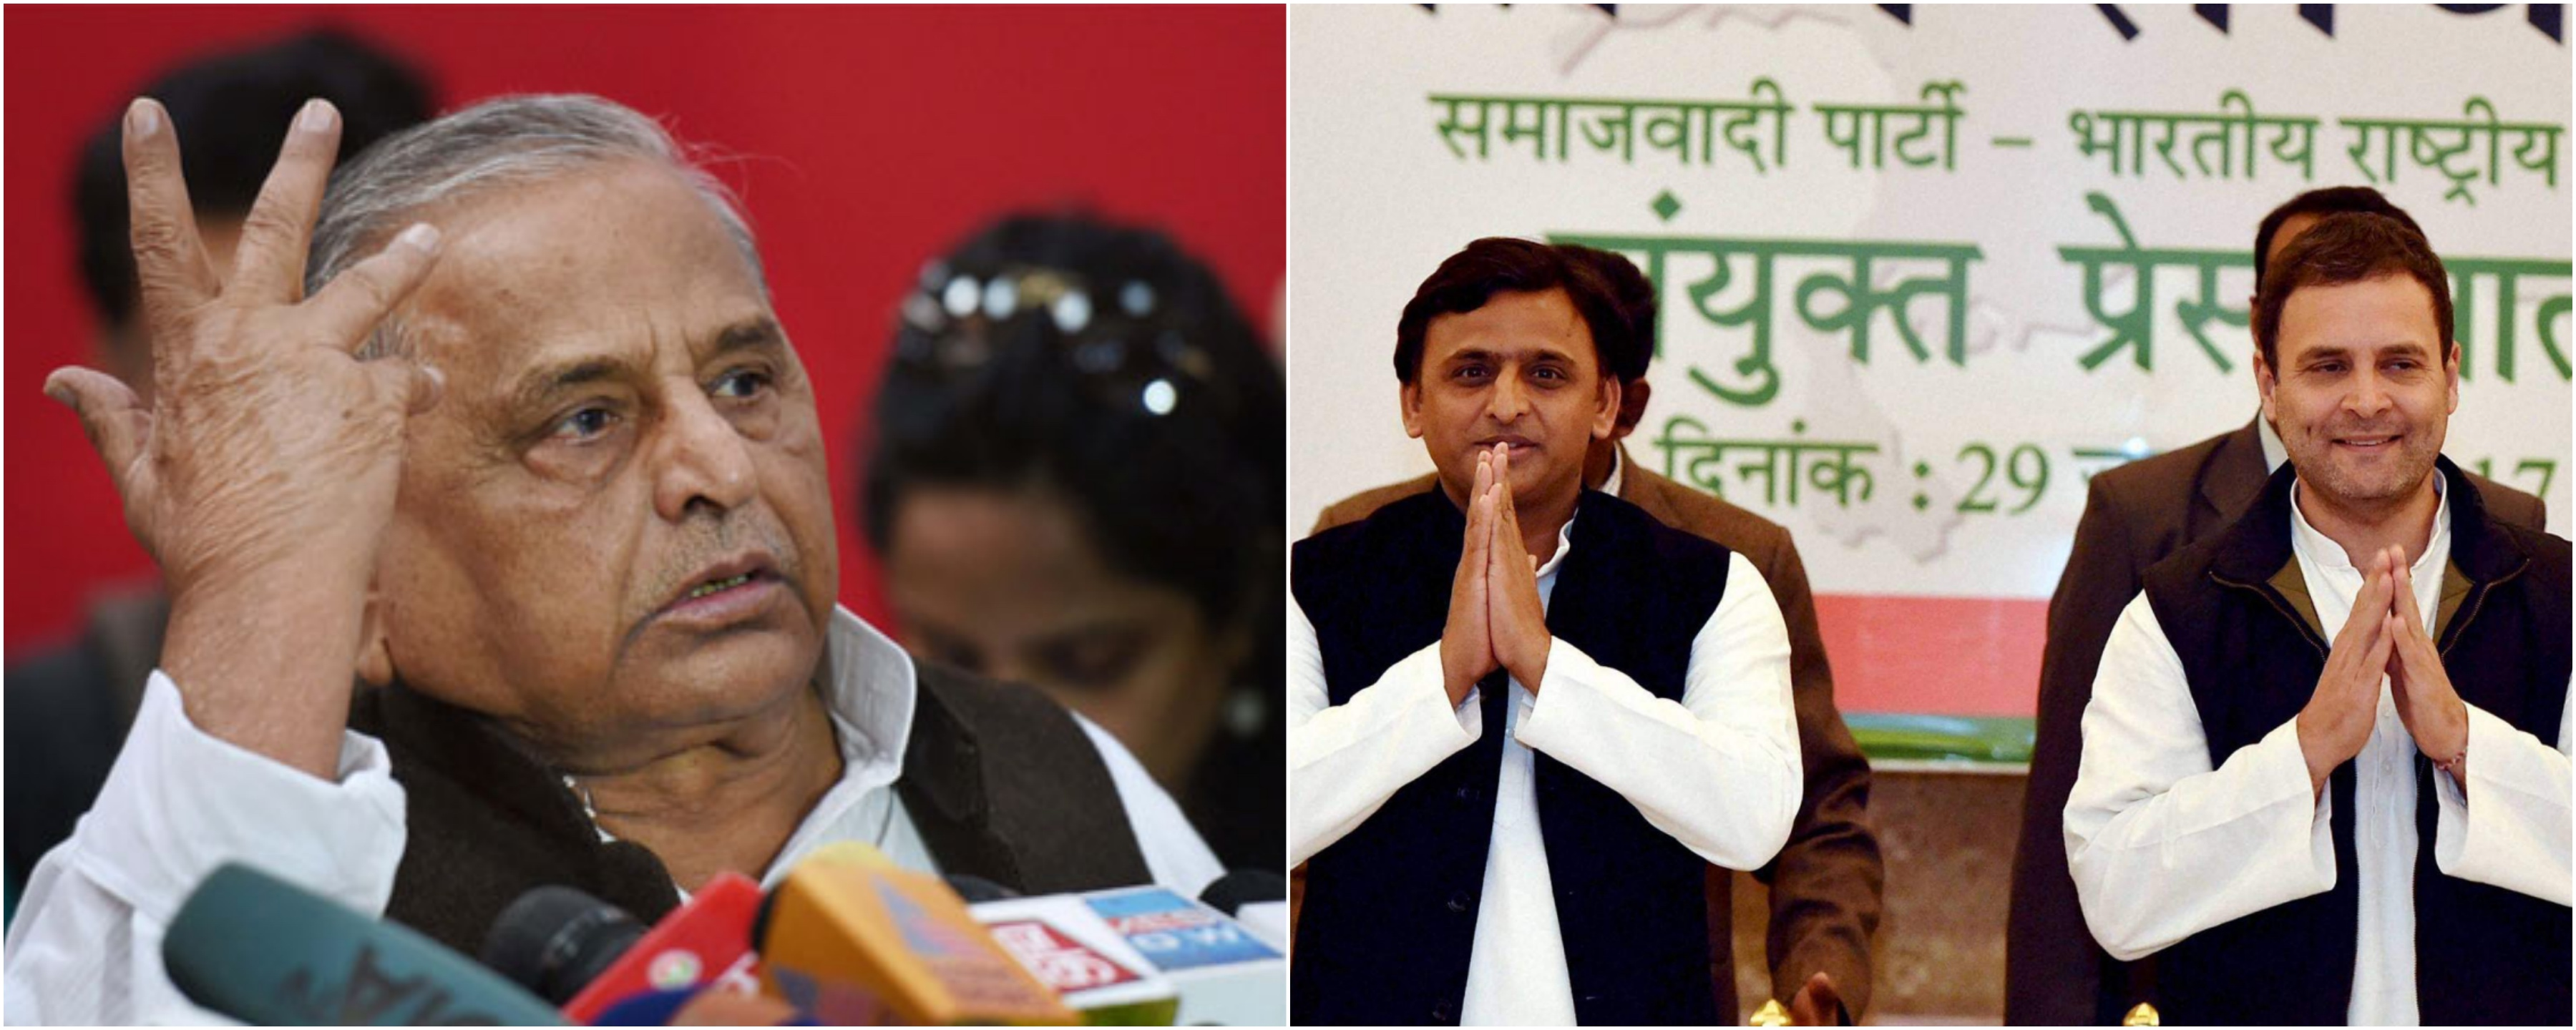 Mulayam Singh Yadav has criticised the Samajwadi Party-Congress alliance. Credit: PTI